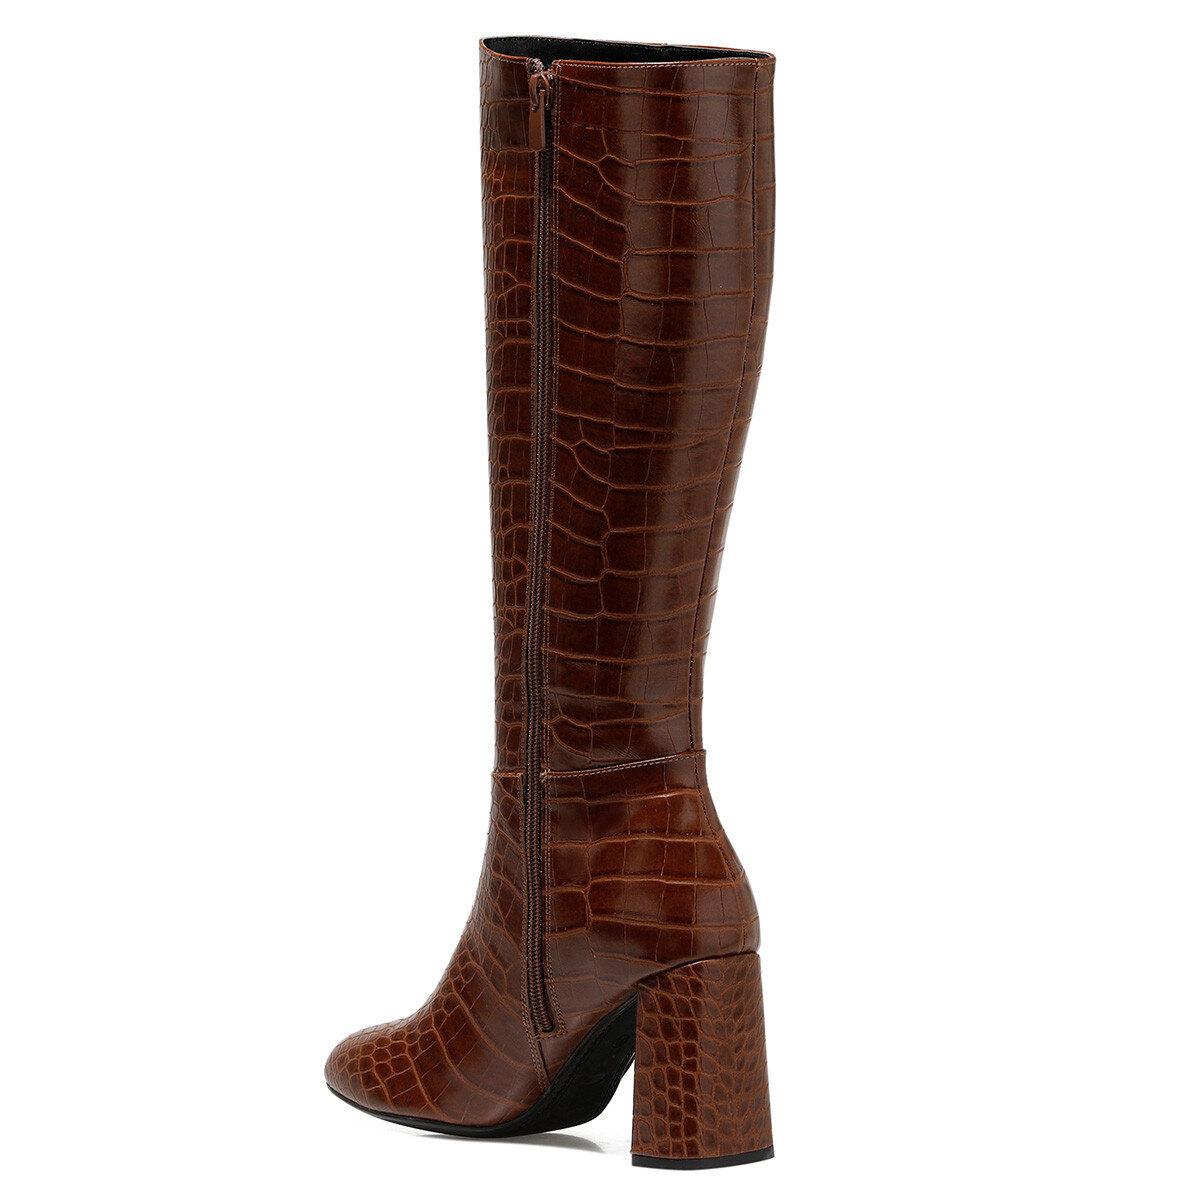 SIMMA-CR Taba Kadın Topuklu Çizme